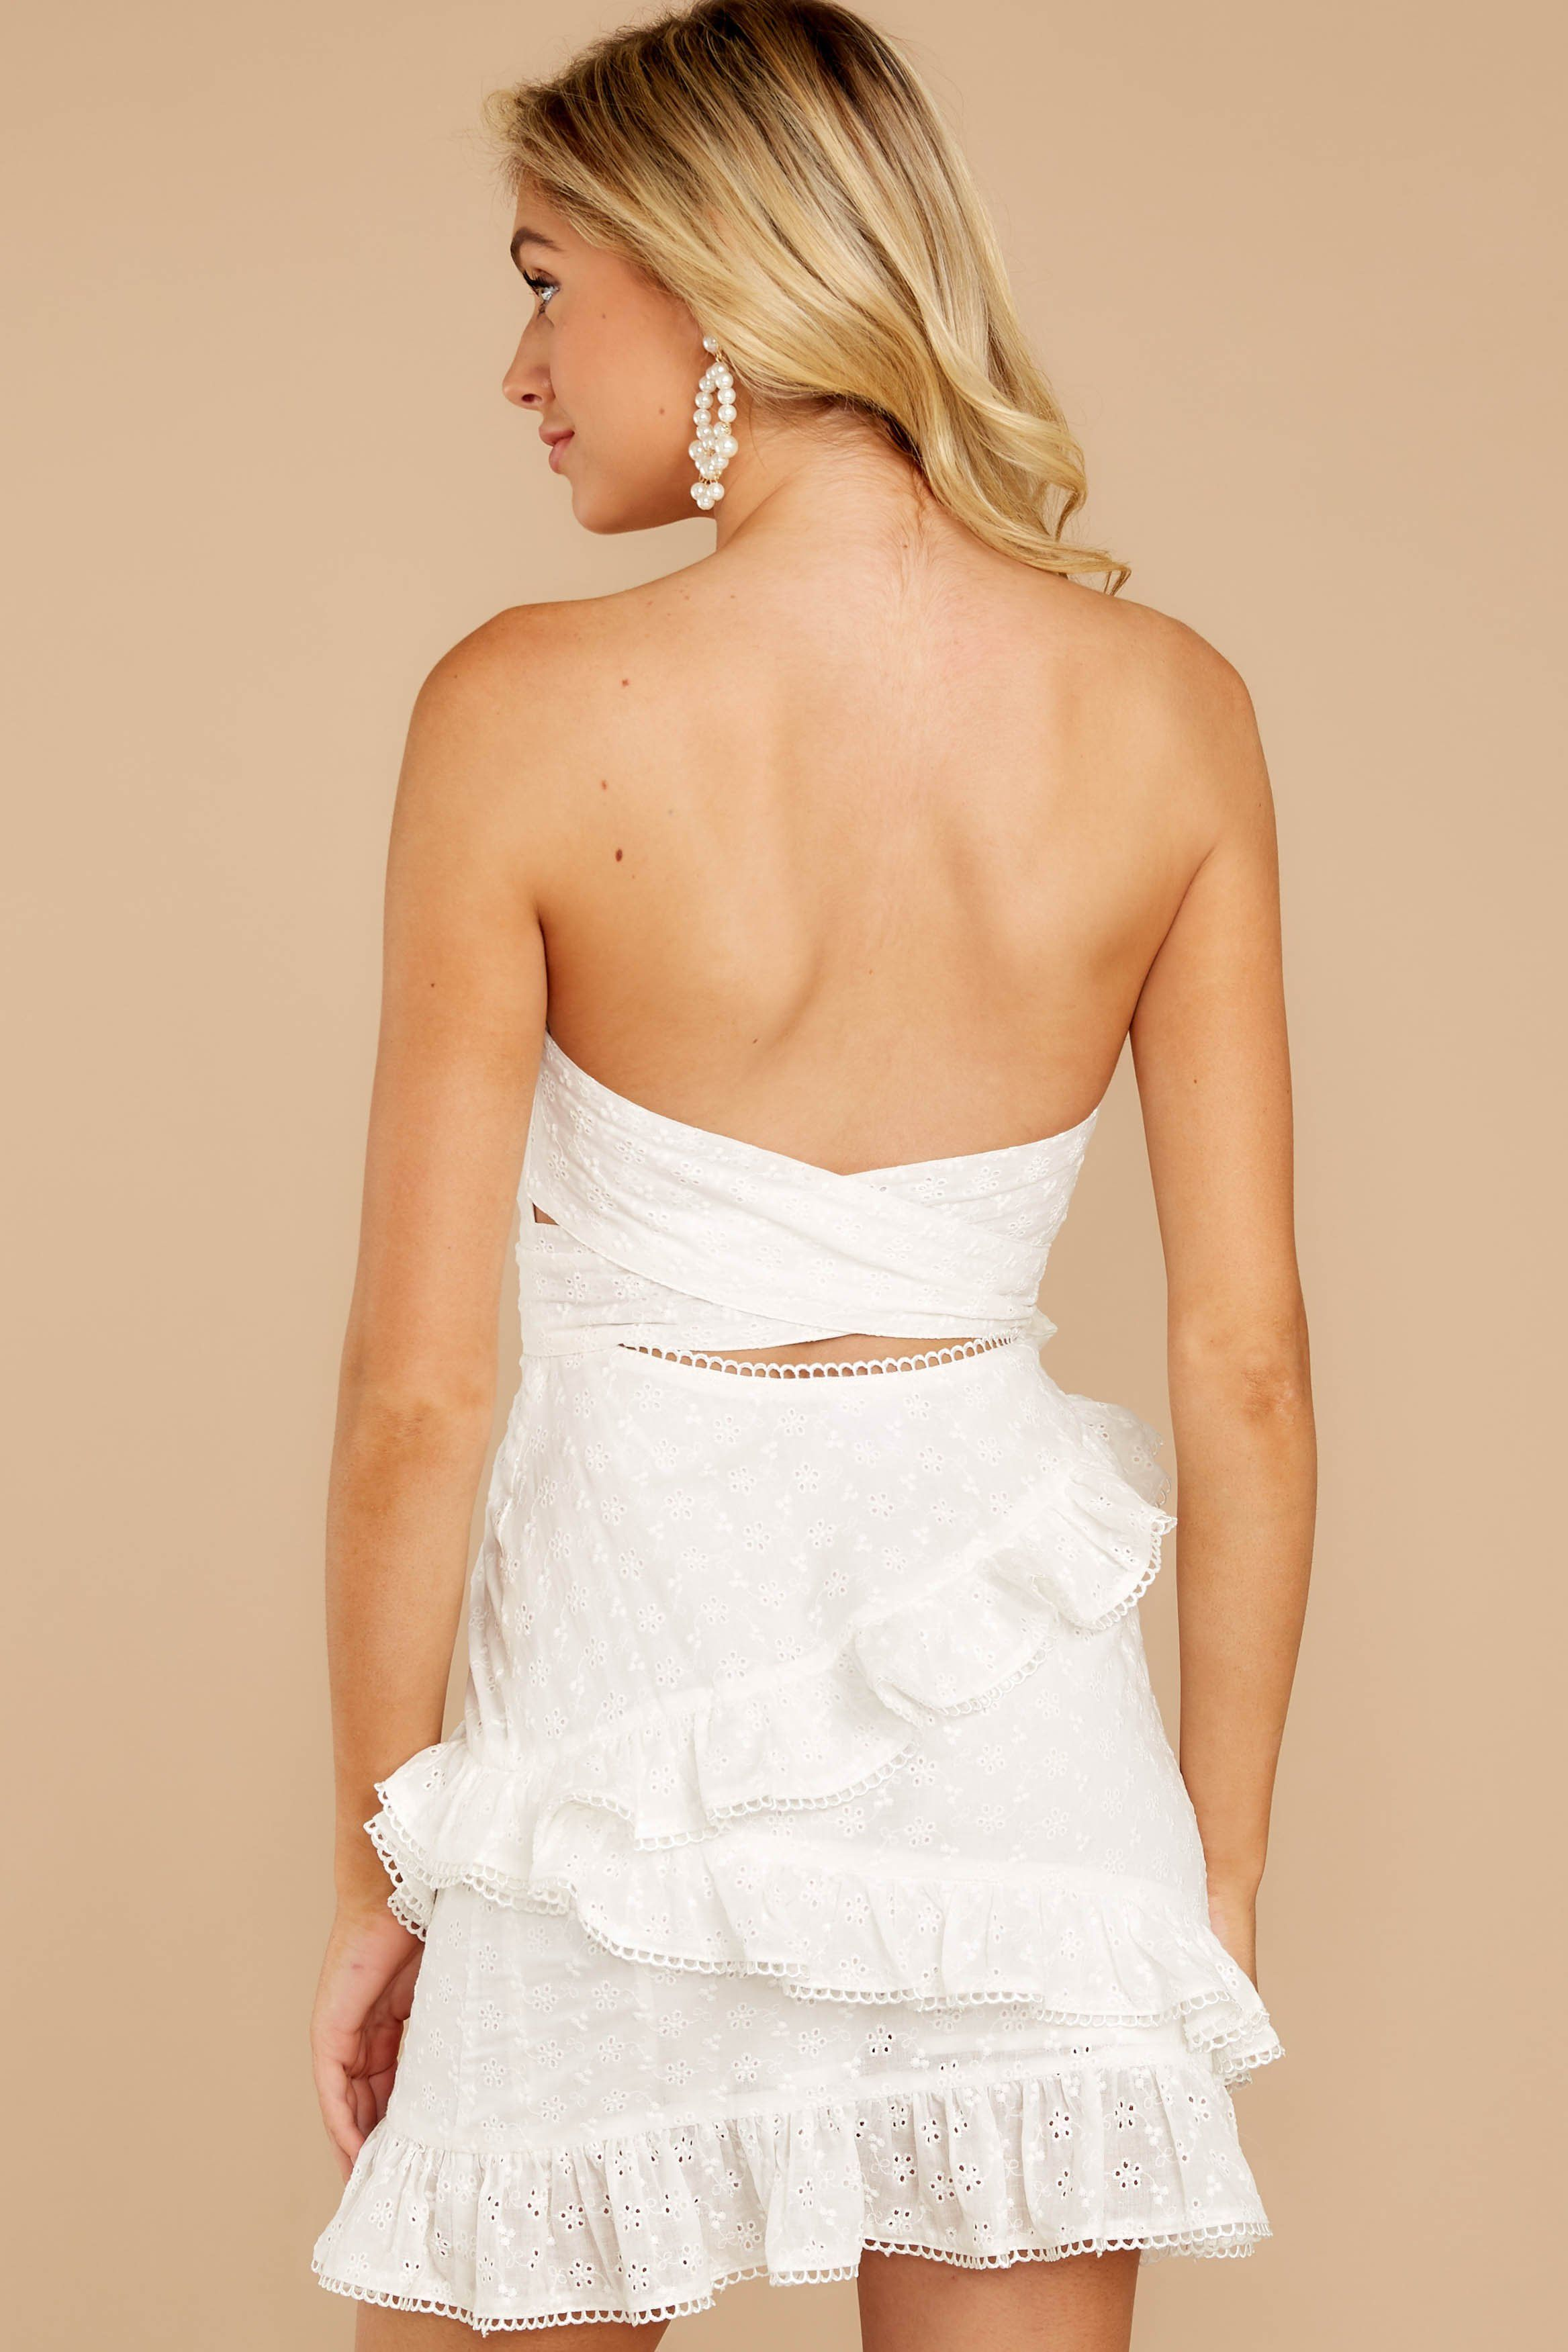 Chic White Eyelet Lace Dress Short Strapless Dress Dress 58 00 Red Dress Strapless Dresses Short Short Lace Dress Eyelet Lace Dress [ 3502 x 2335 Pixel ]